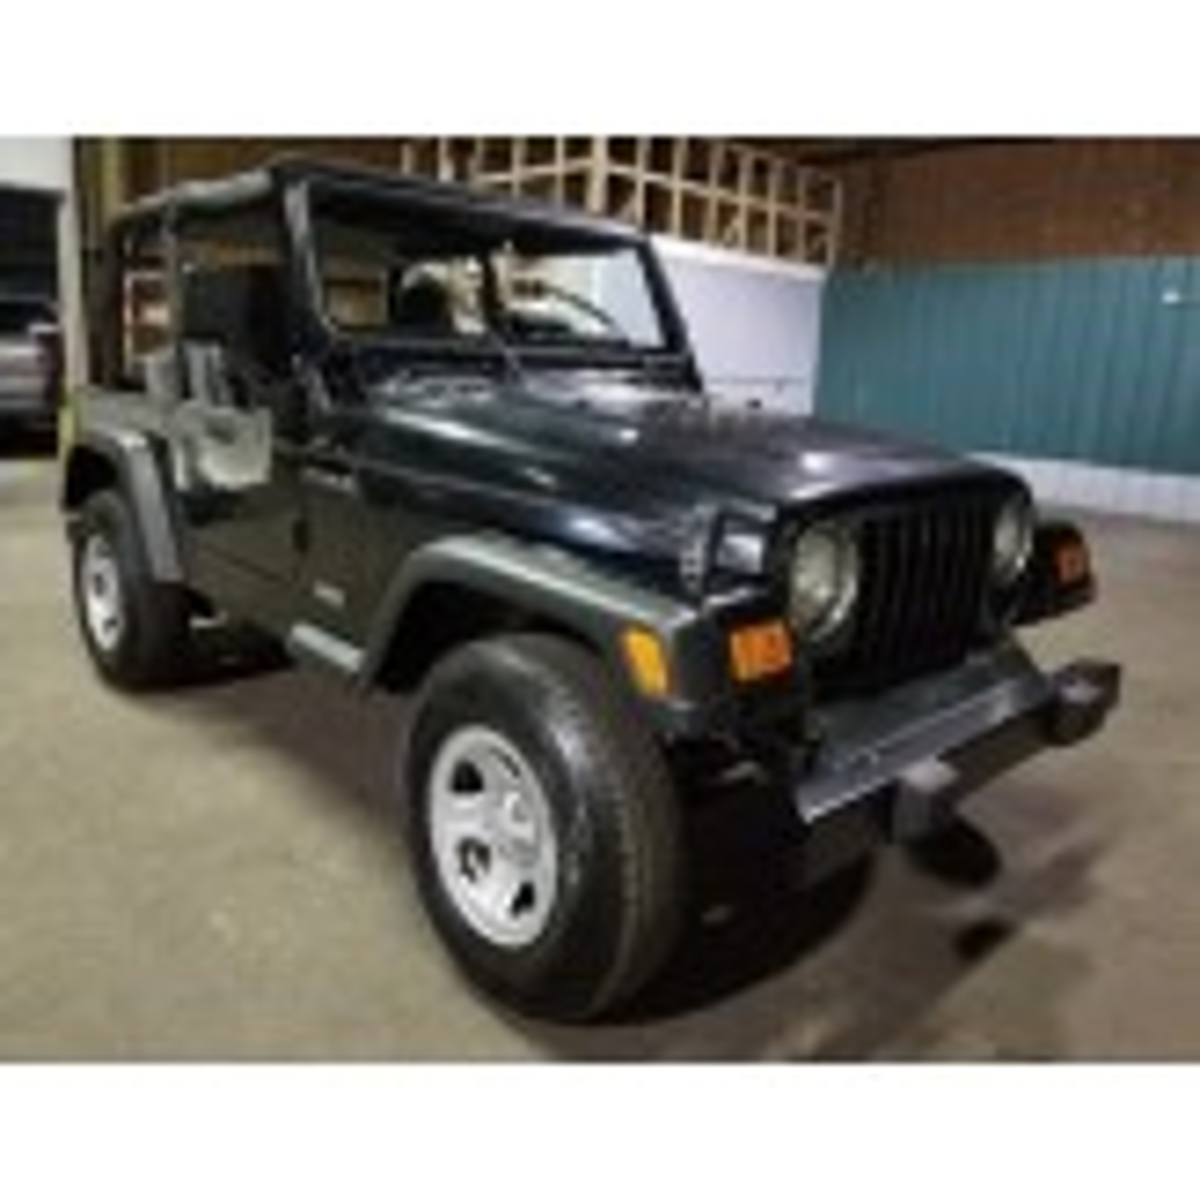 2000 Jeep Wrangler...Sorry, already sold